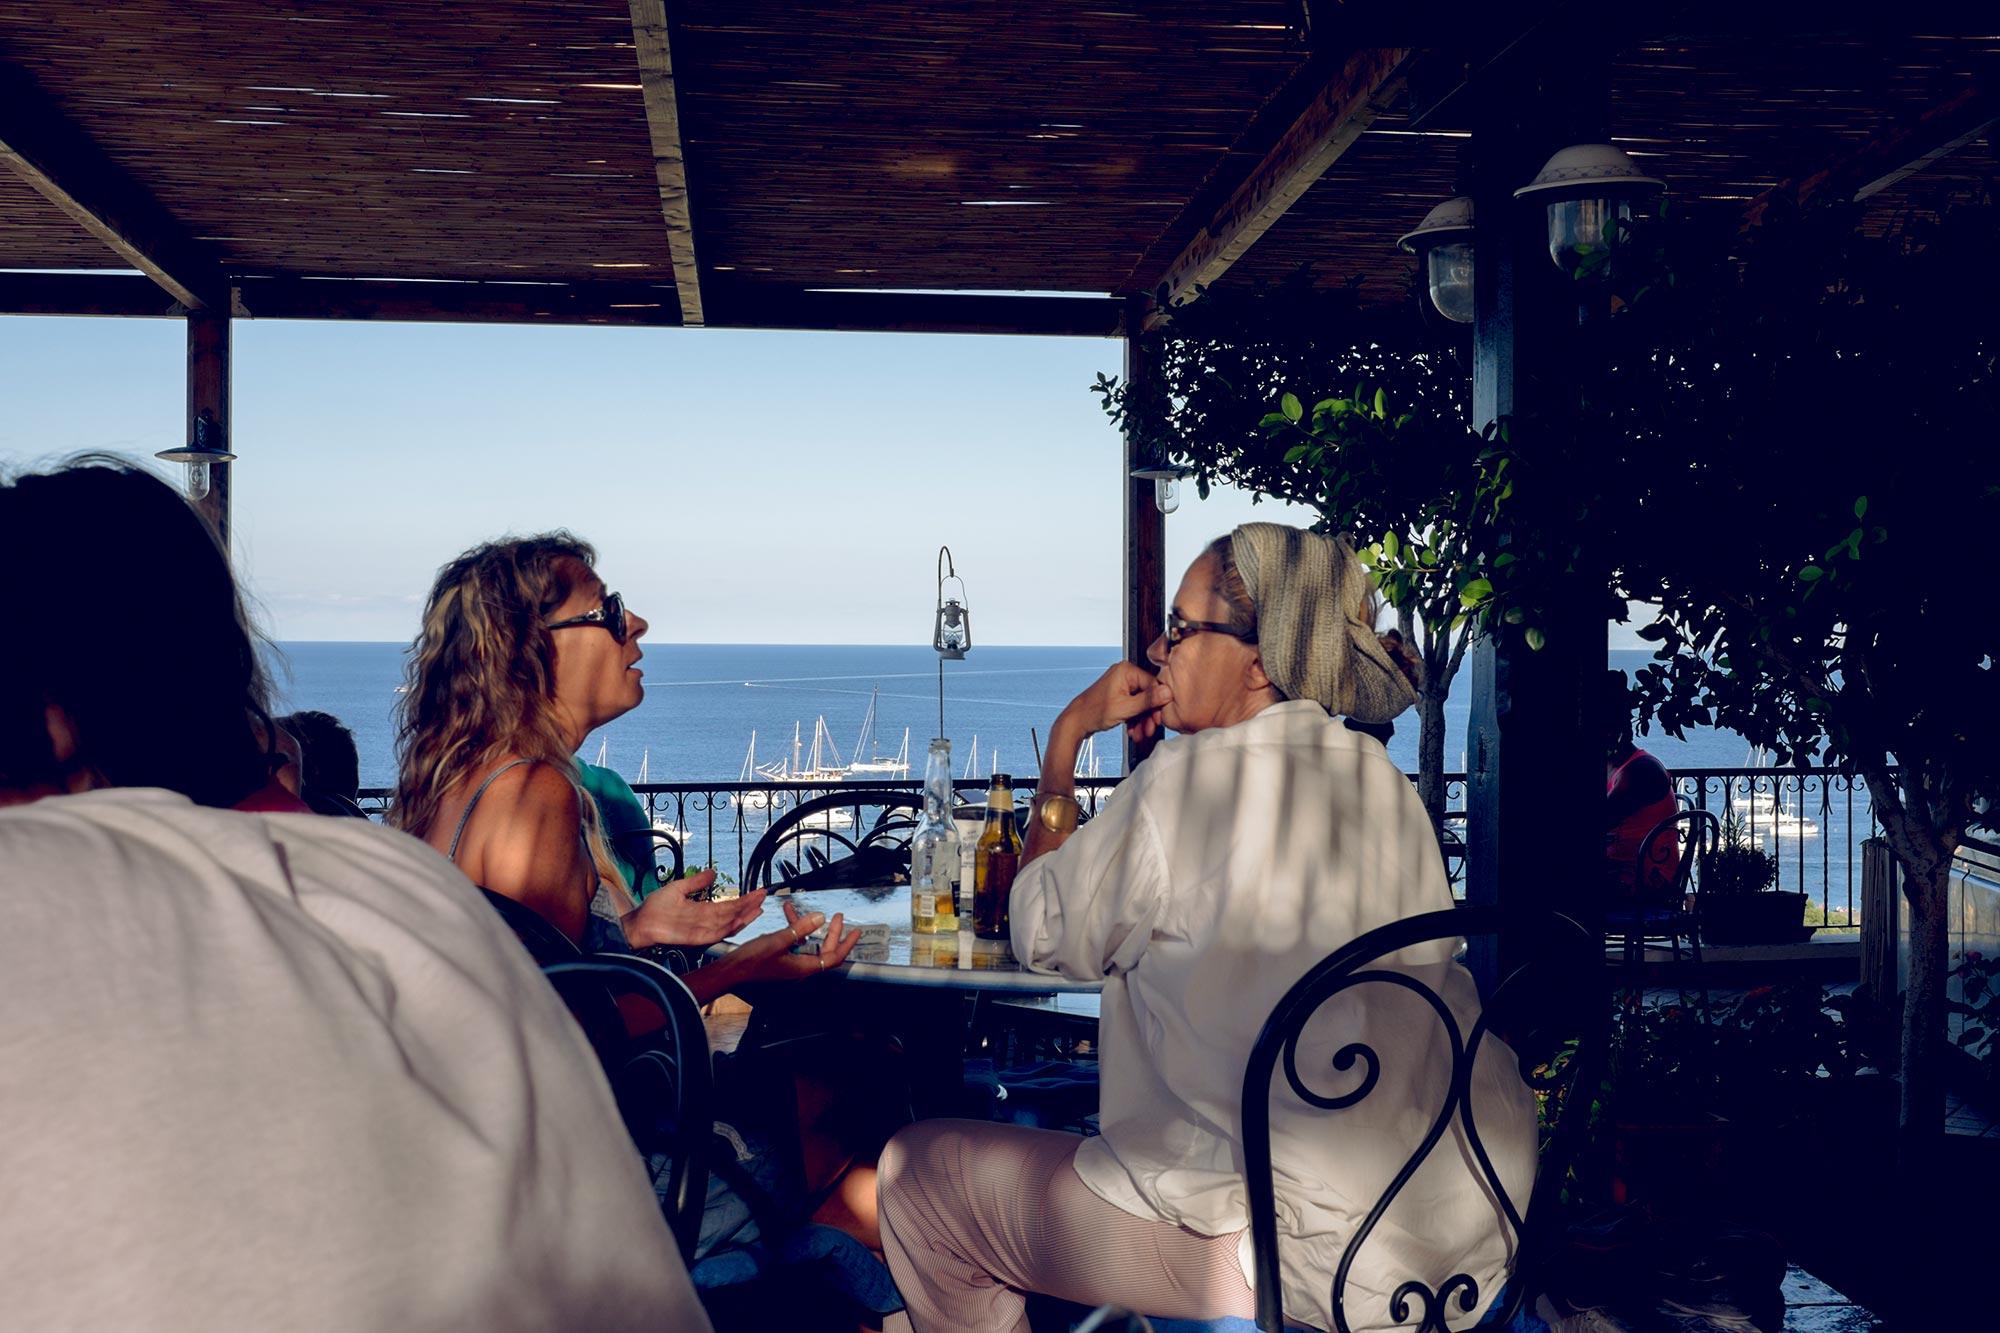 italy-sicilia-eolie-stromboli-terrace-people